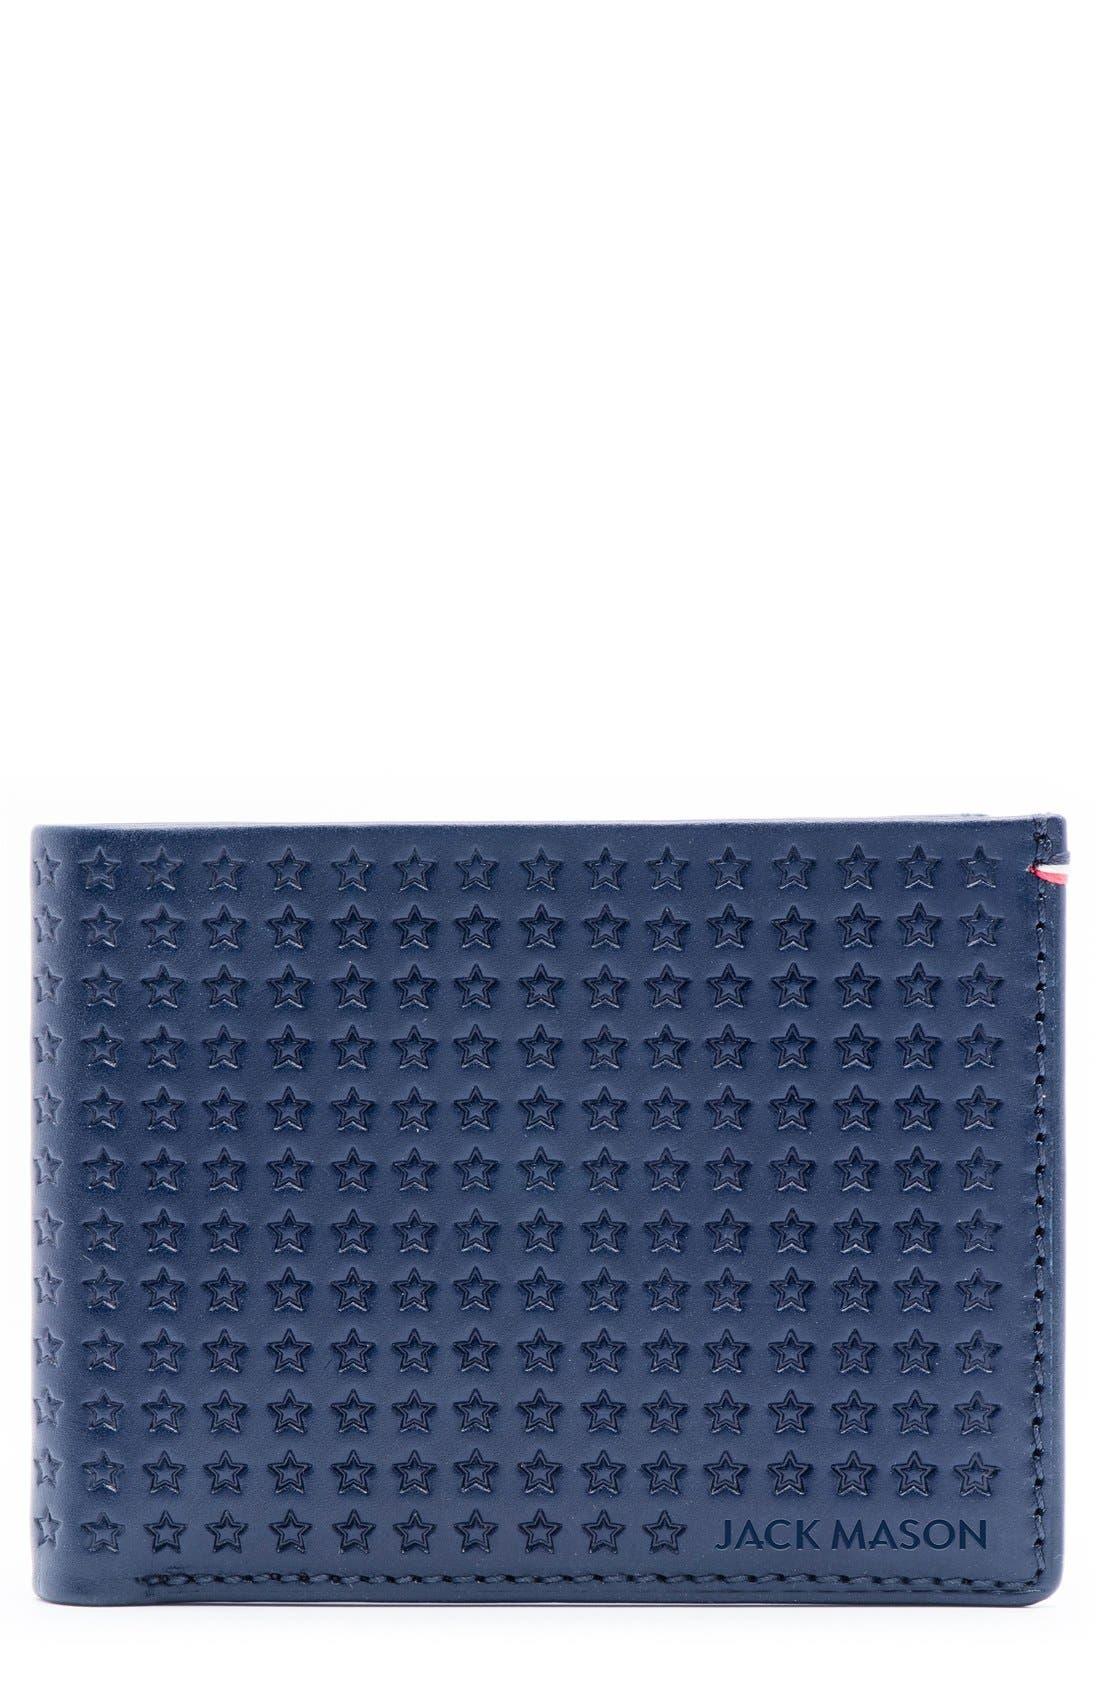 JACK MASON Star Leather Bifold Wallet